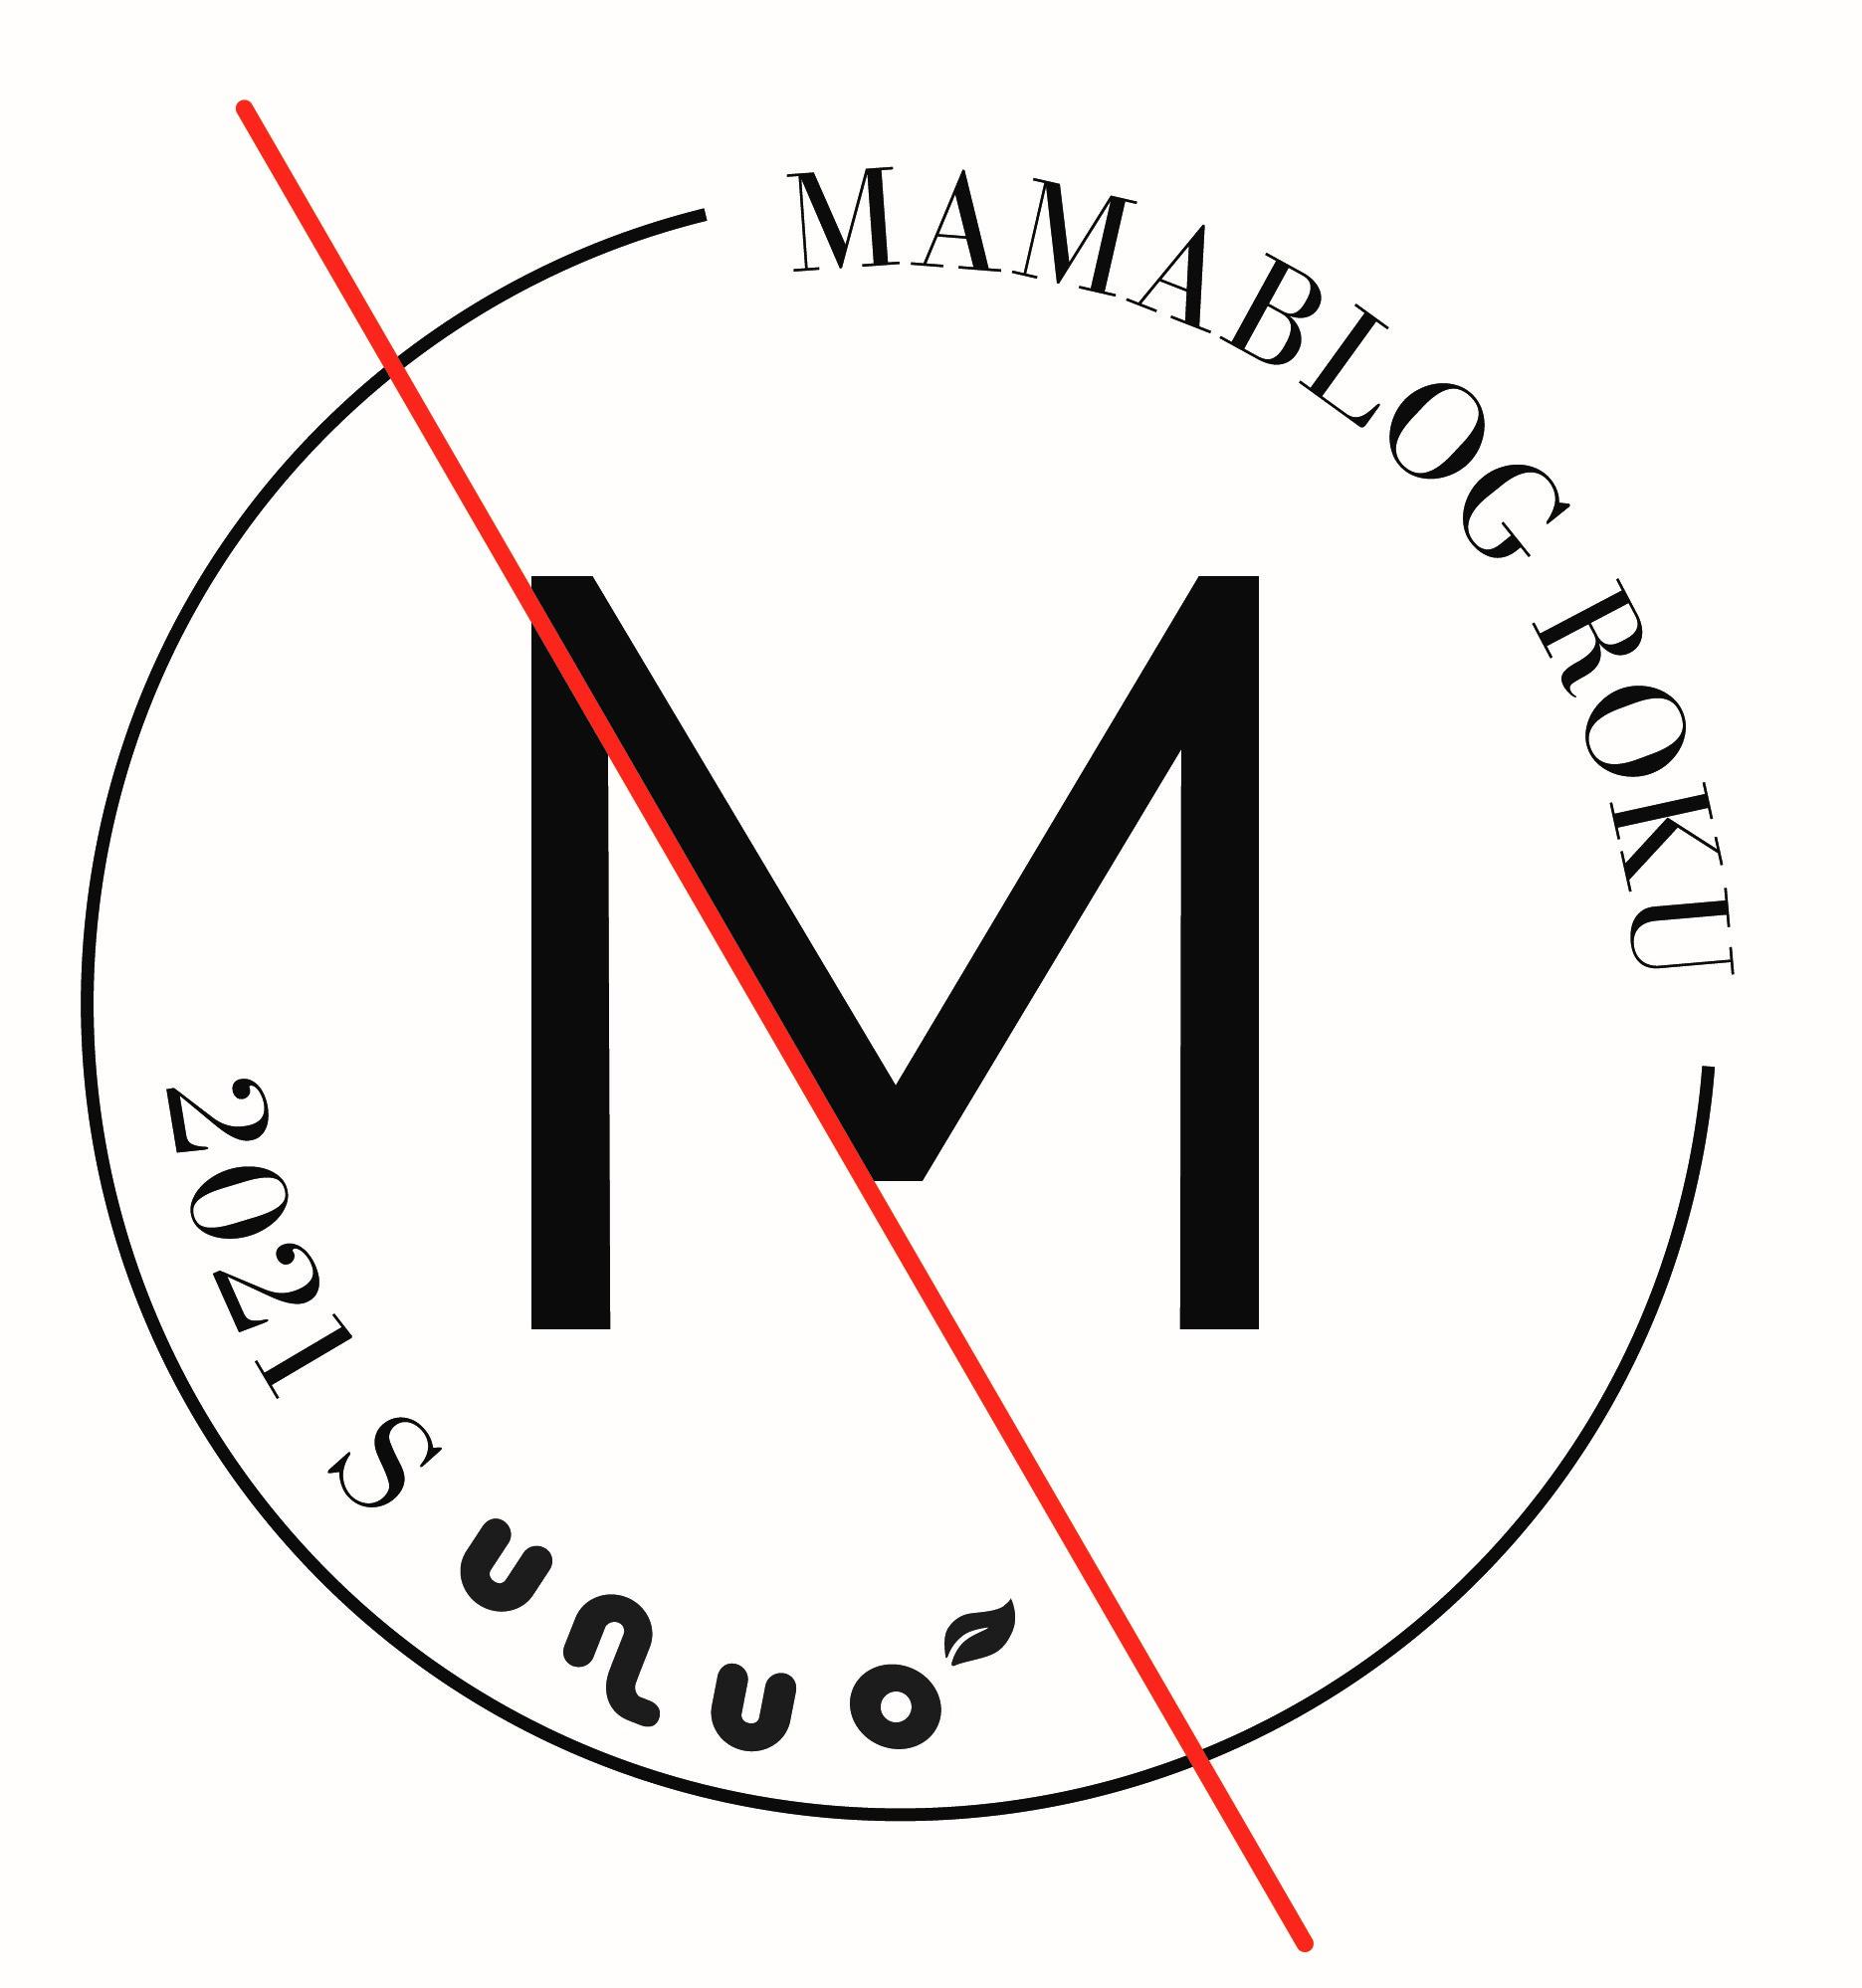 logo MAMABlog roku 2021